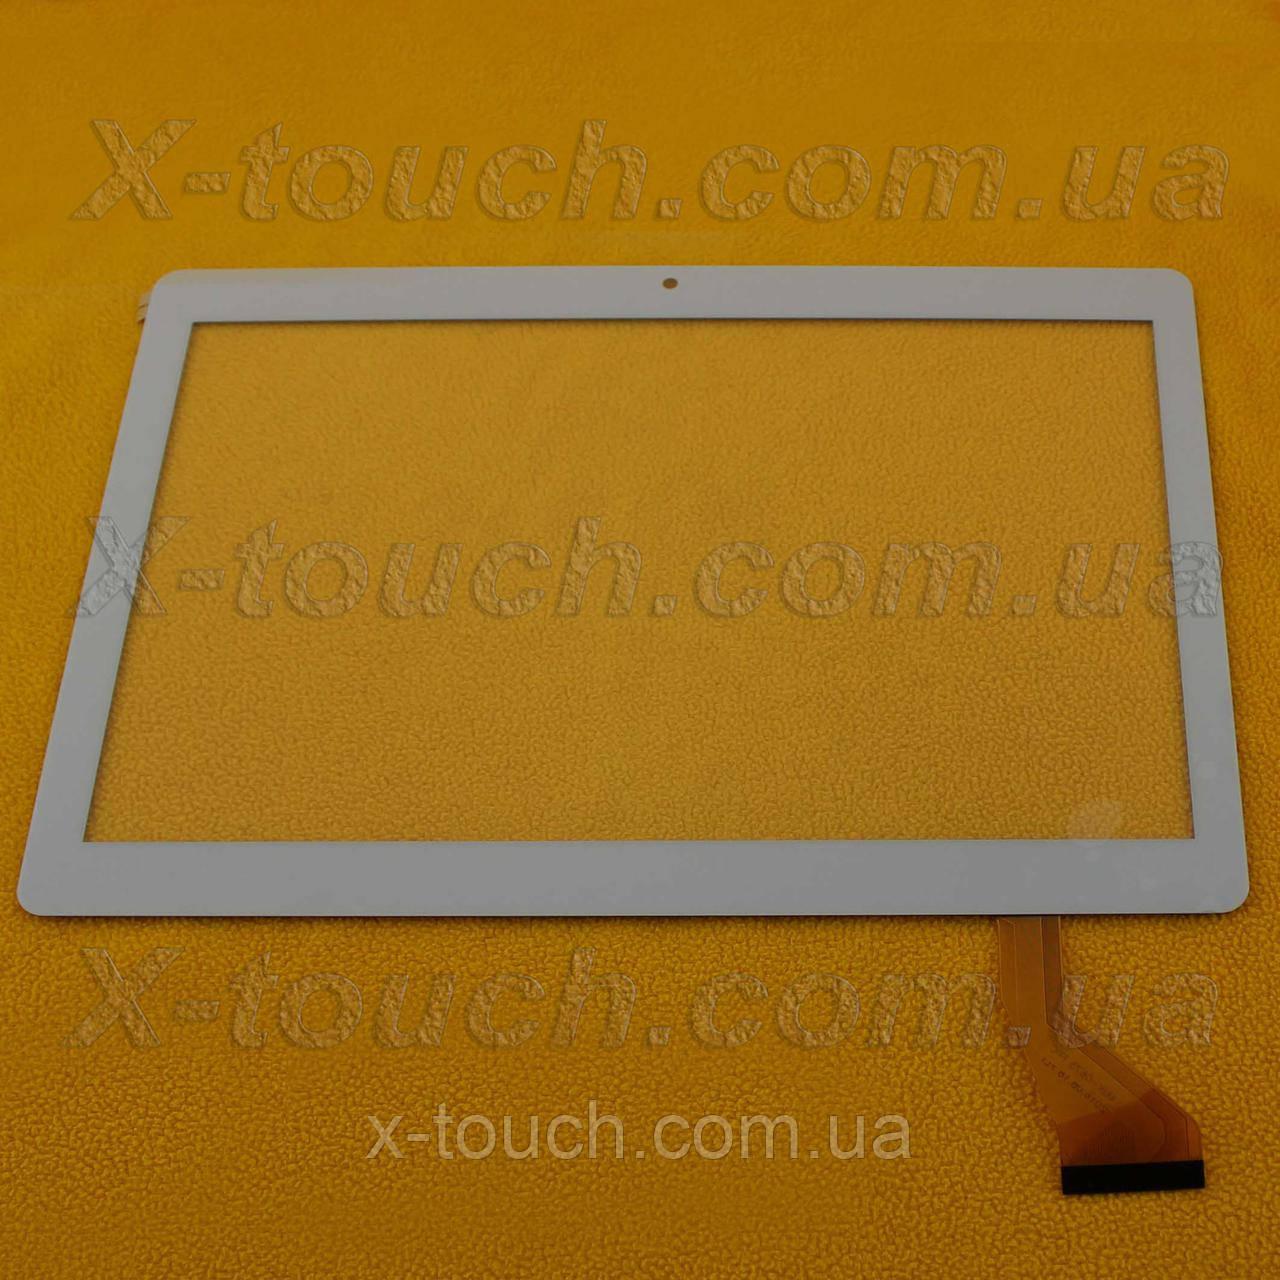 Cенсор, тачскрин Teclast 98 4G, белого цвета.